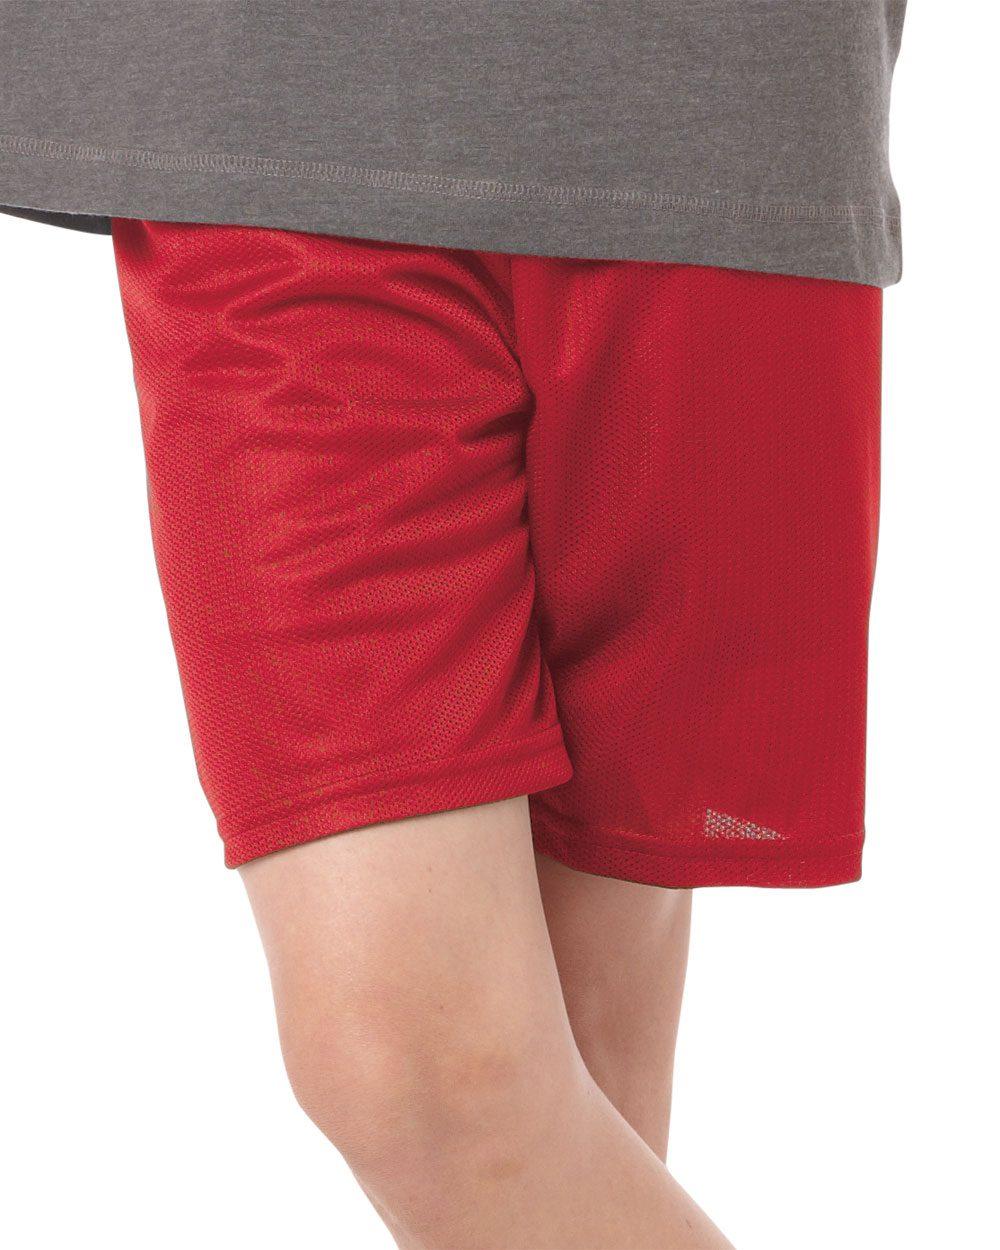 Badger Sport 2237 中青年青少年6 裤腿内缝网眼短裤